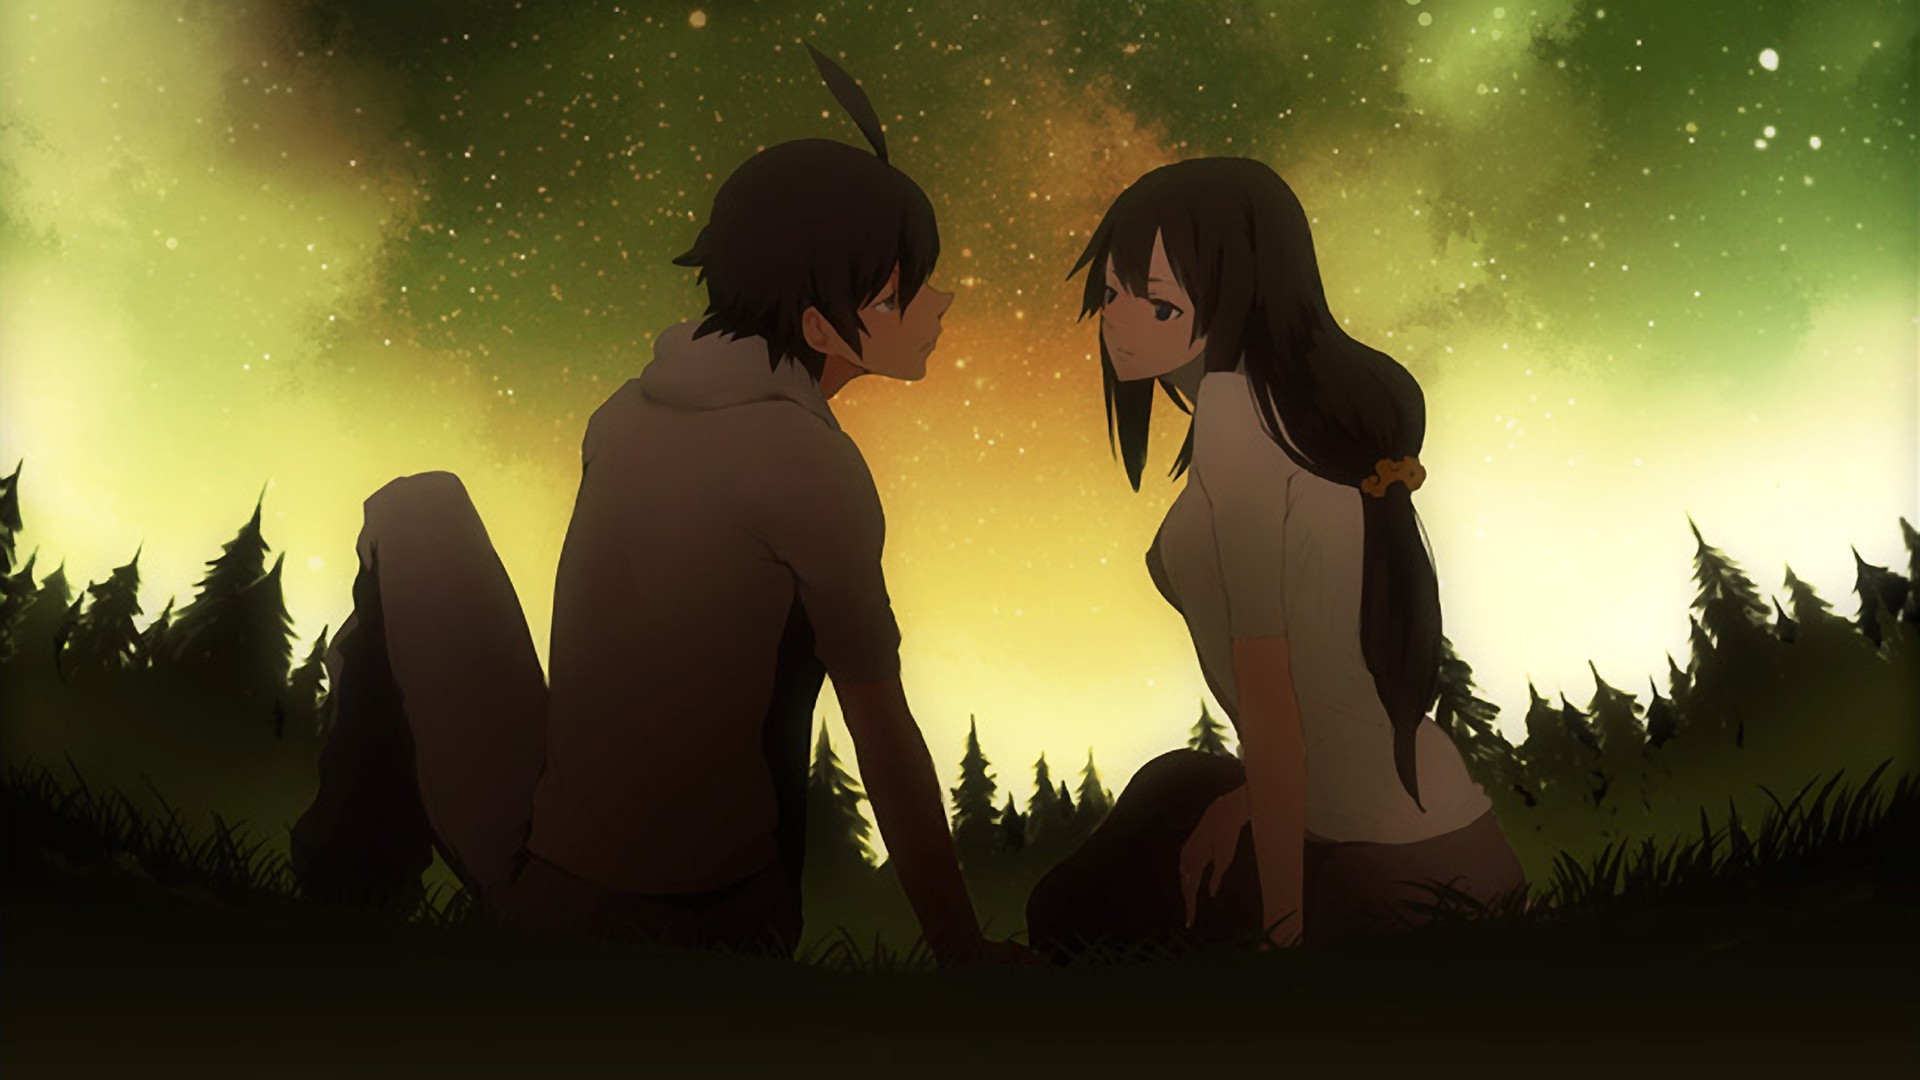 Res: 1920x1080, Anime Couple Wallpaper